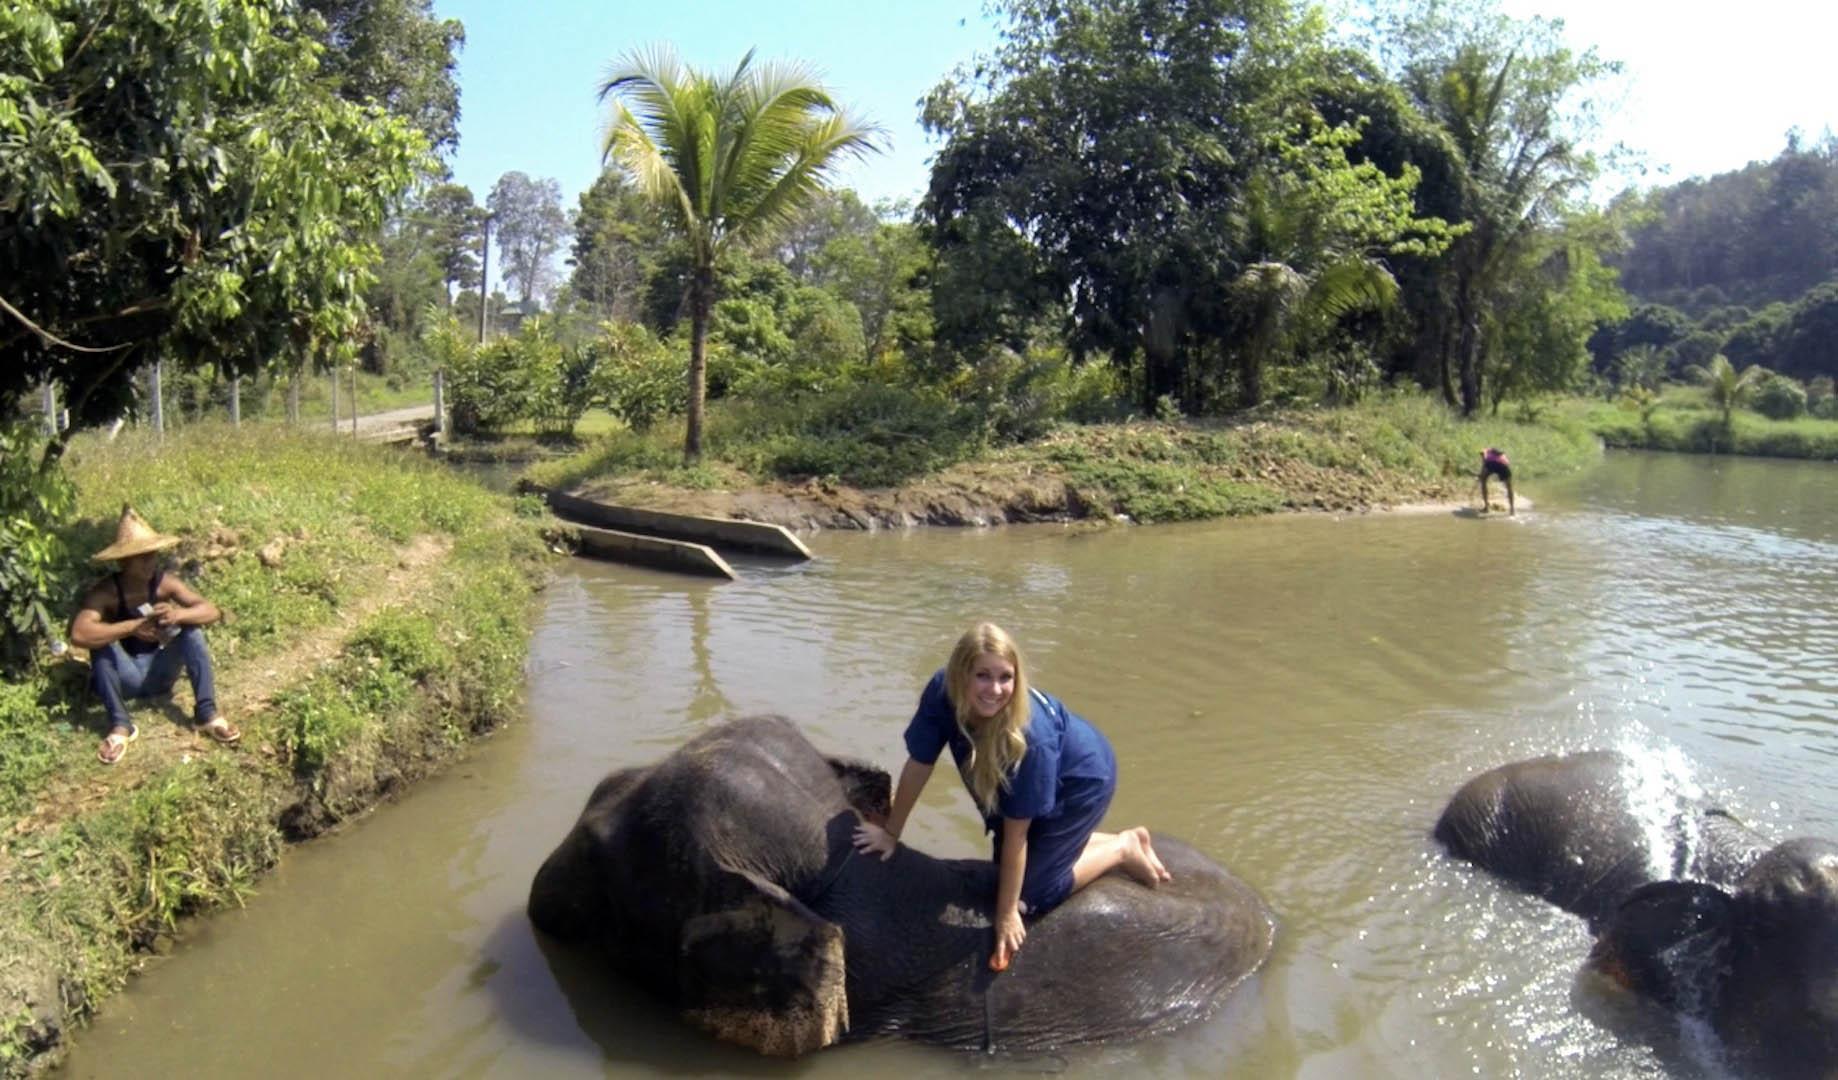 Elephant washing in Baan Chang